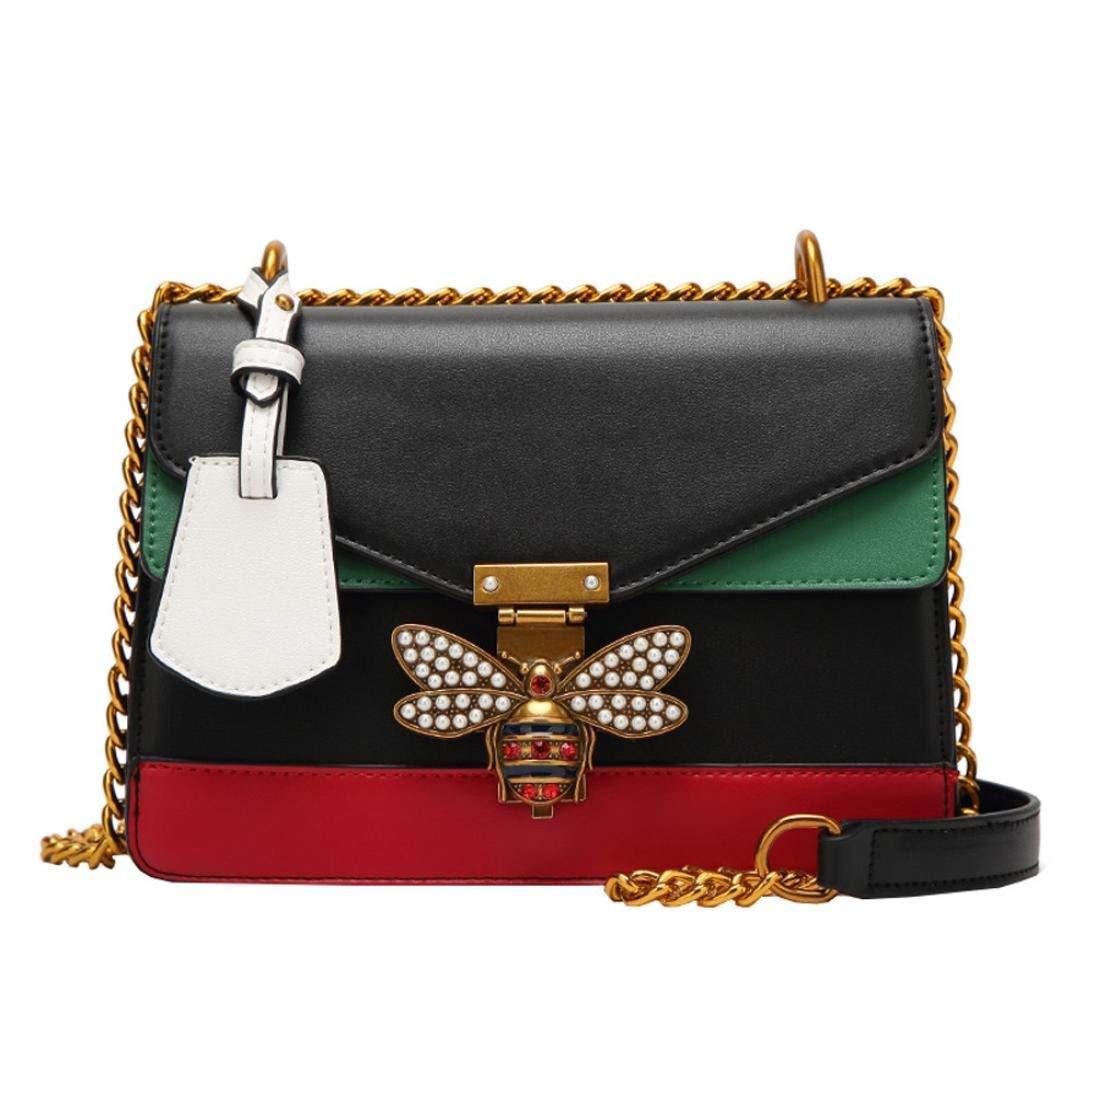 Crossbody Bags for Women,BCDshop Totes Bags PU Leather Fashion Satchel Shoulder Handbags